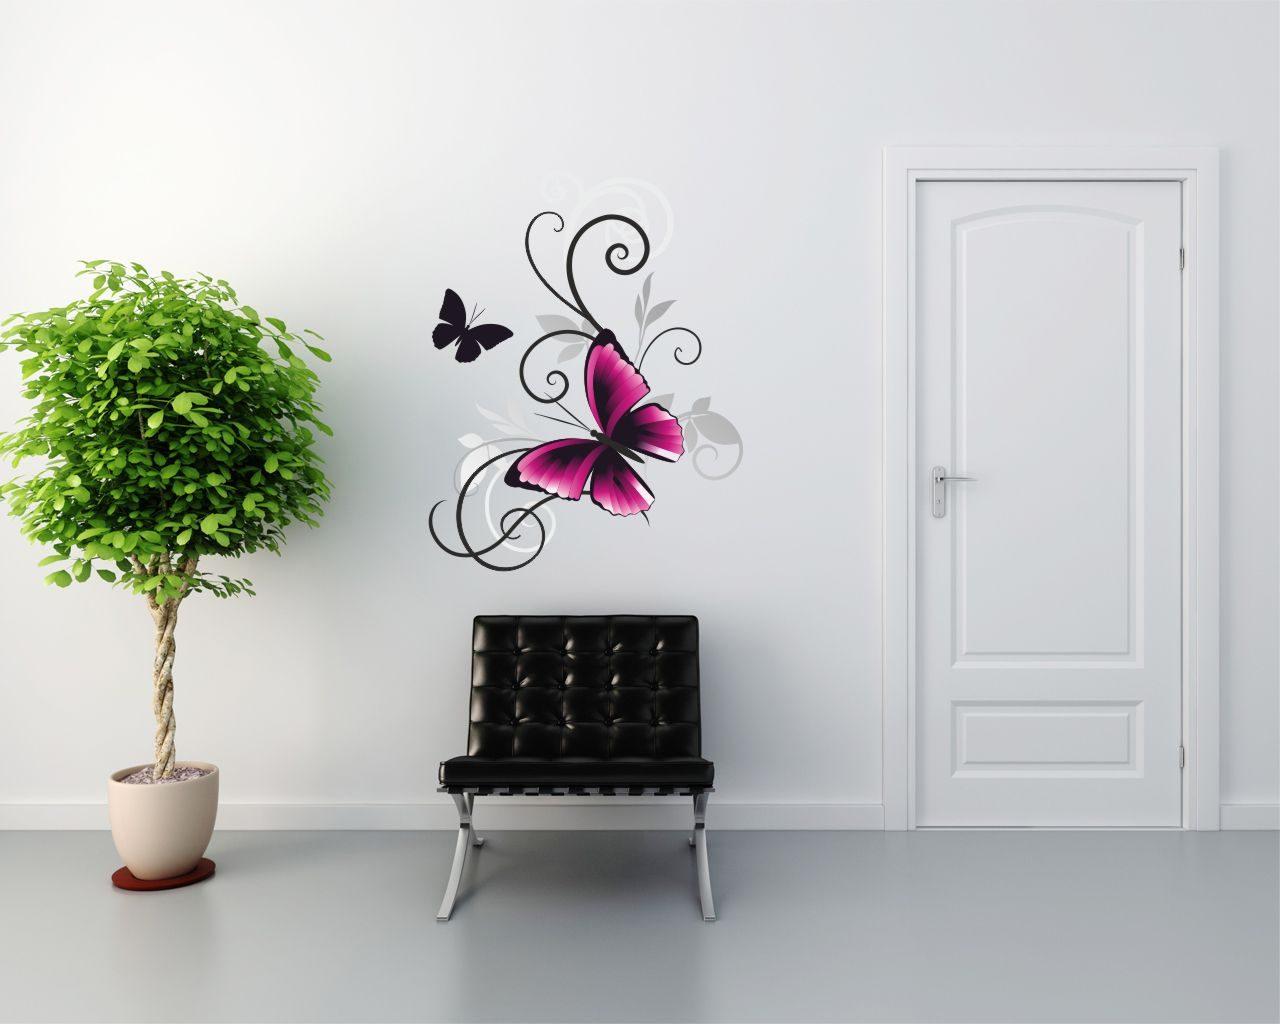 Beautiful pink fly animali adesivo murale - Fly decoration murale ...